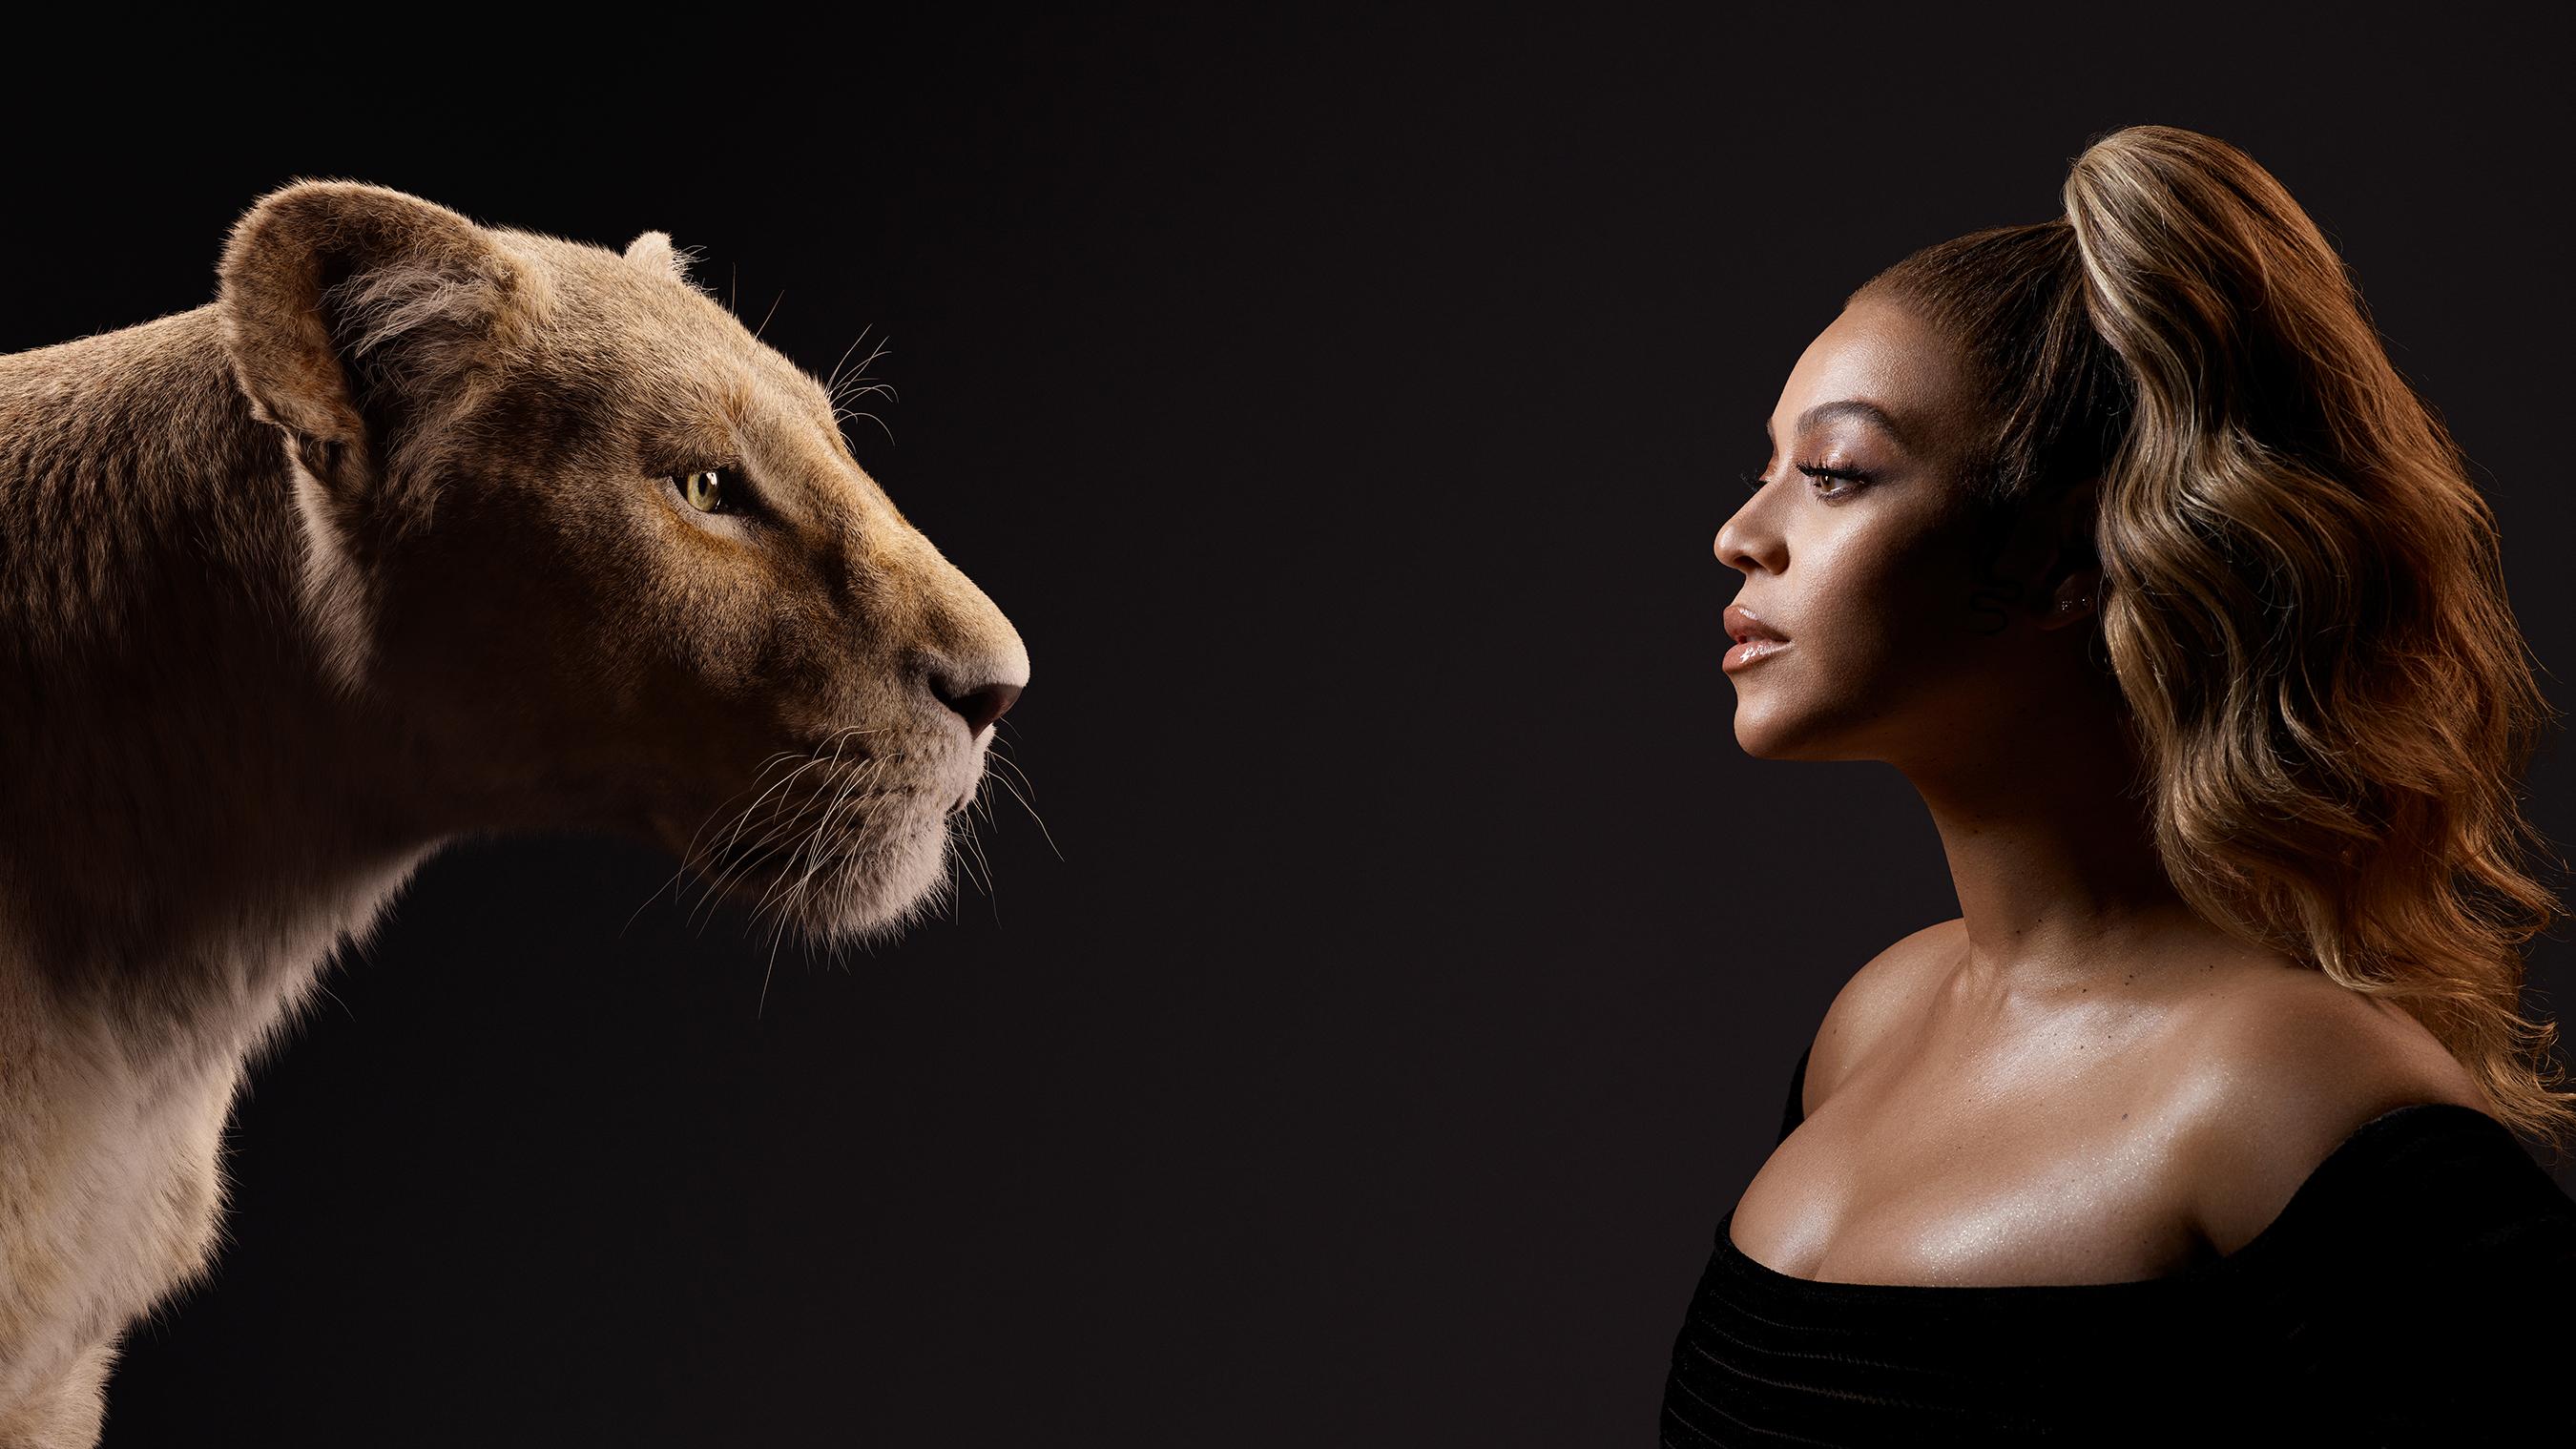 THE LION KING, Beyoncé Knowles Carter